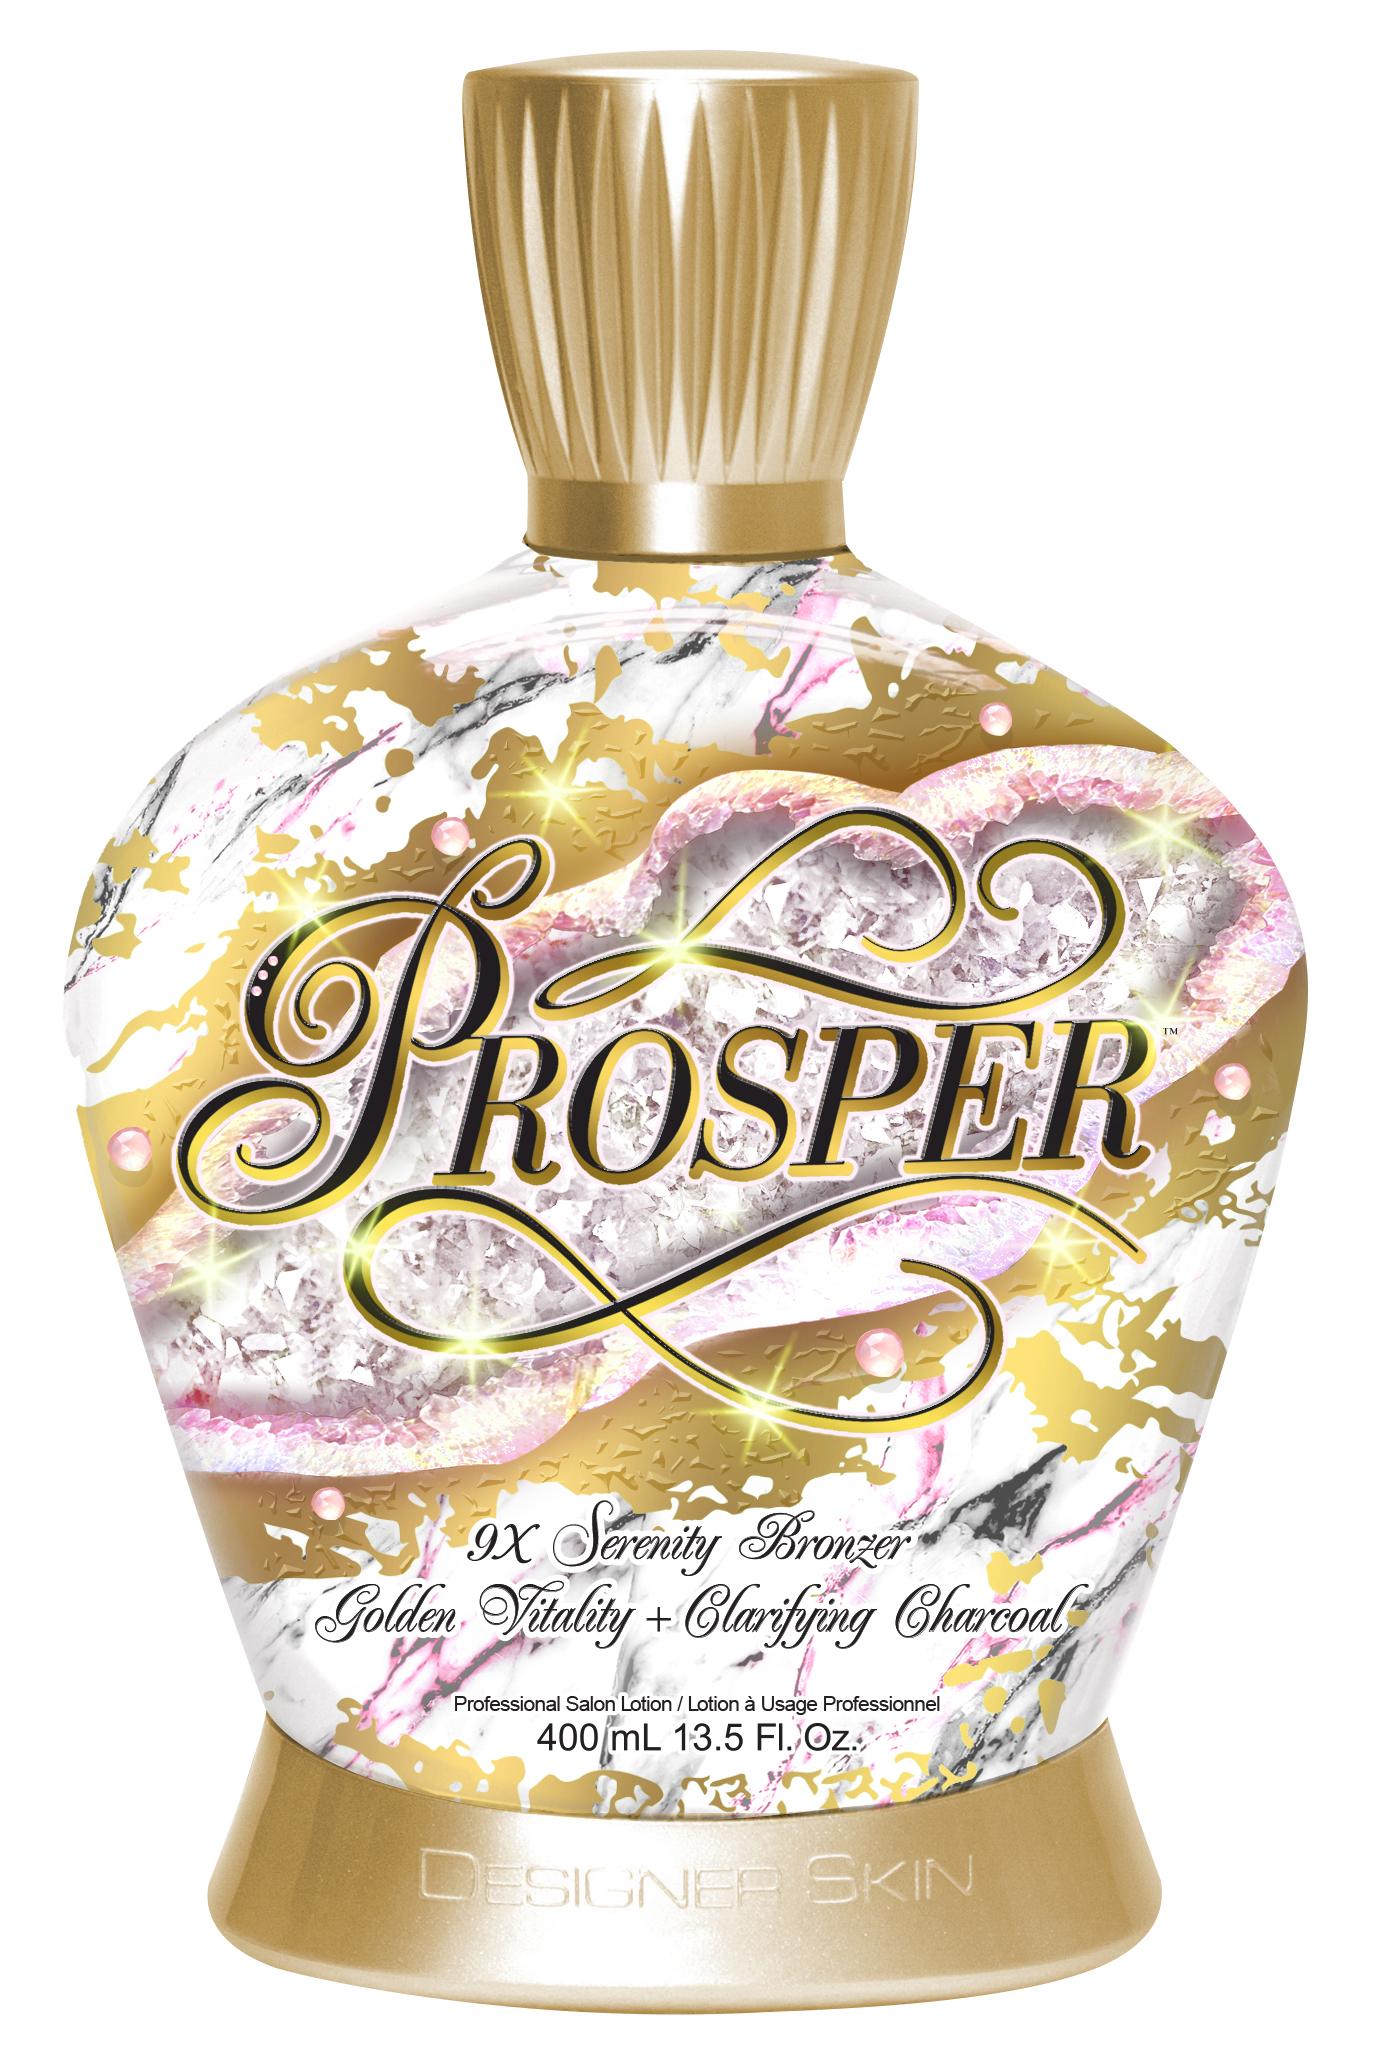 Prosper™ 9X Serenity Bronzer